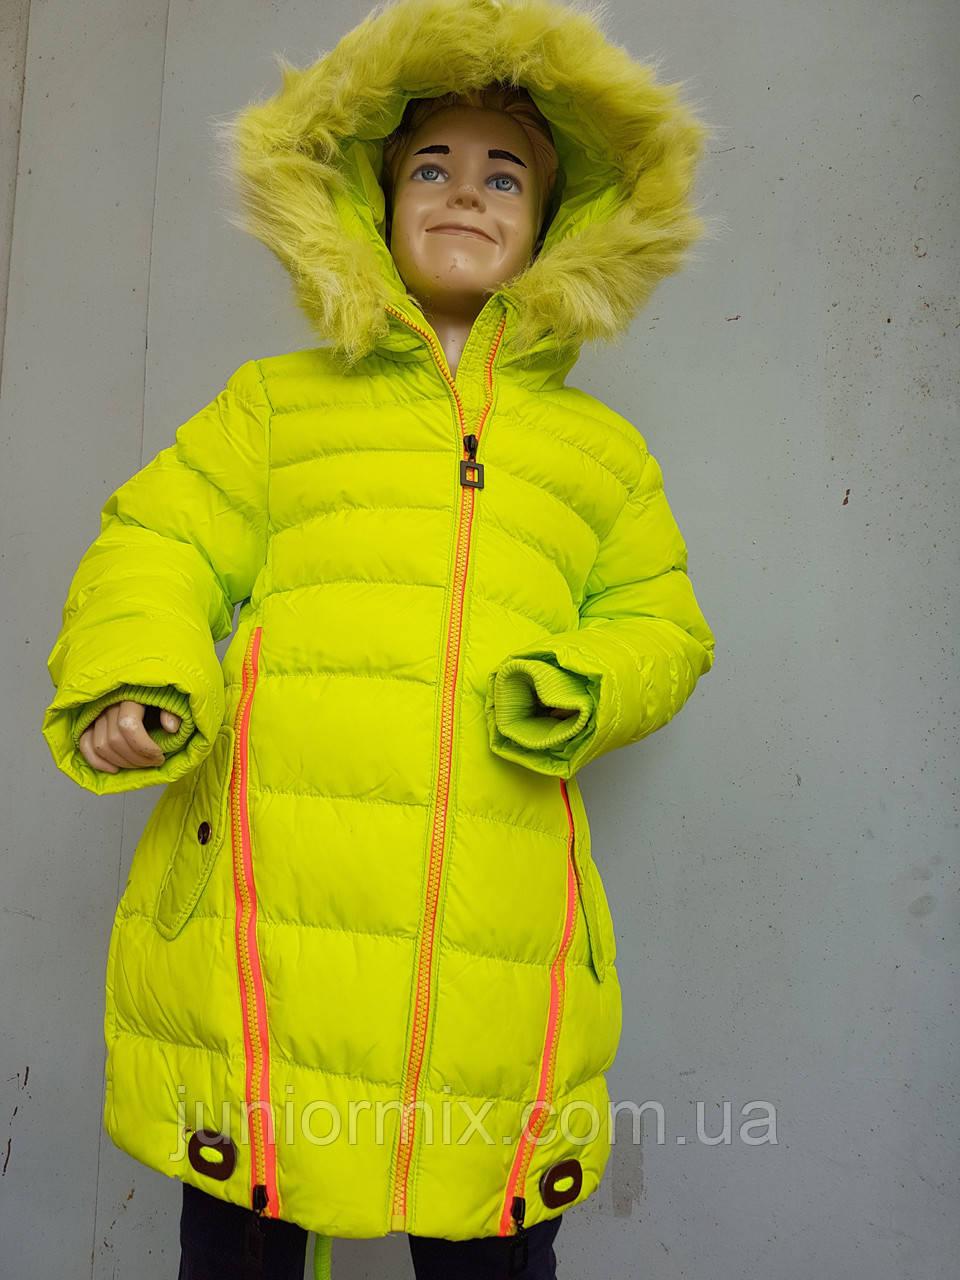 Куртка на девочку зимняя HIKIS со звездой на спине